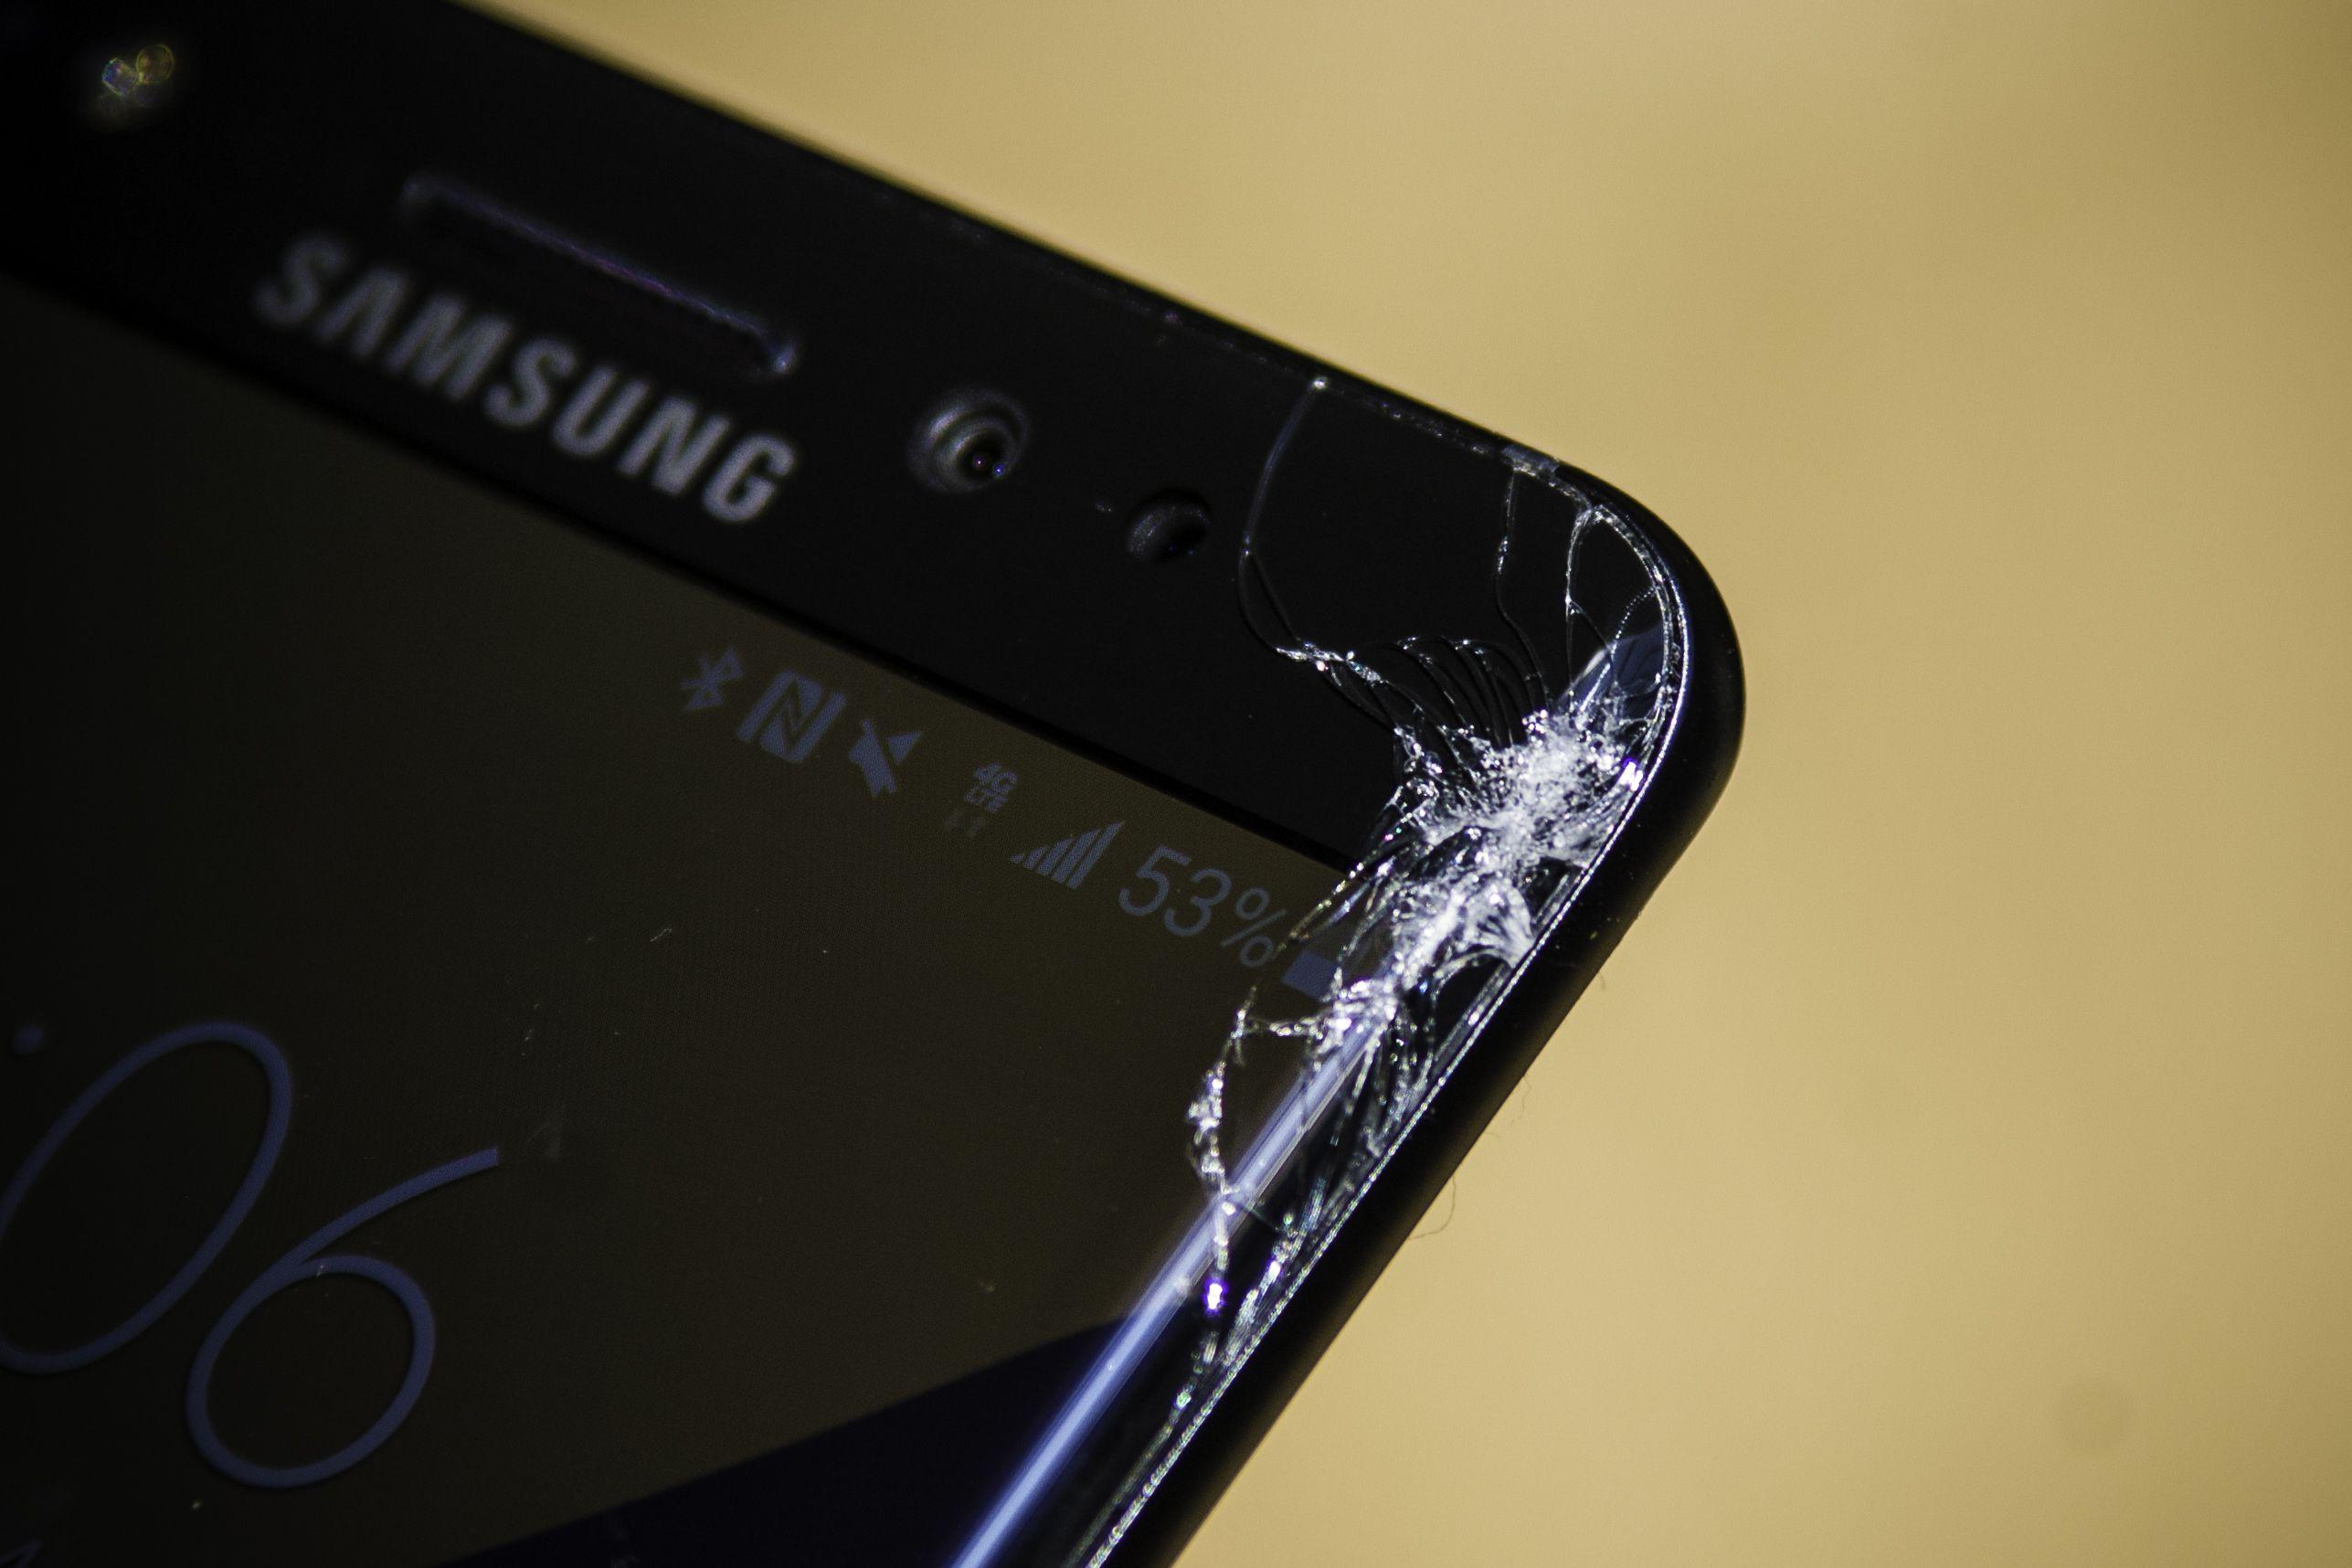 samsung-cracked-screen-note-7.jpg